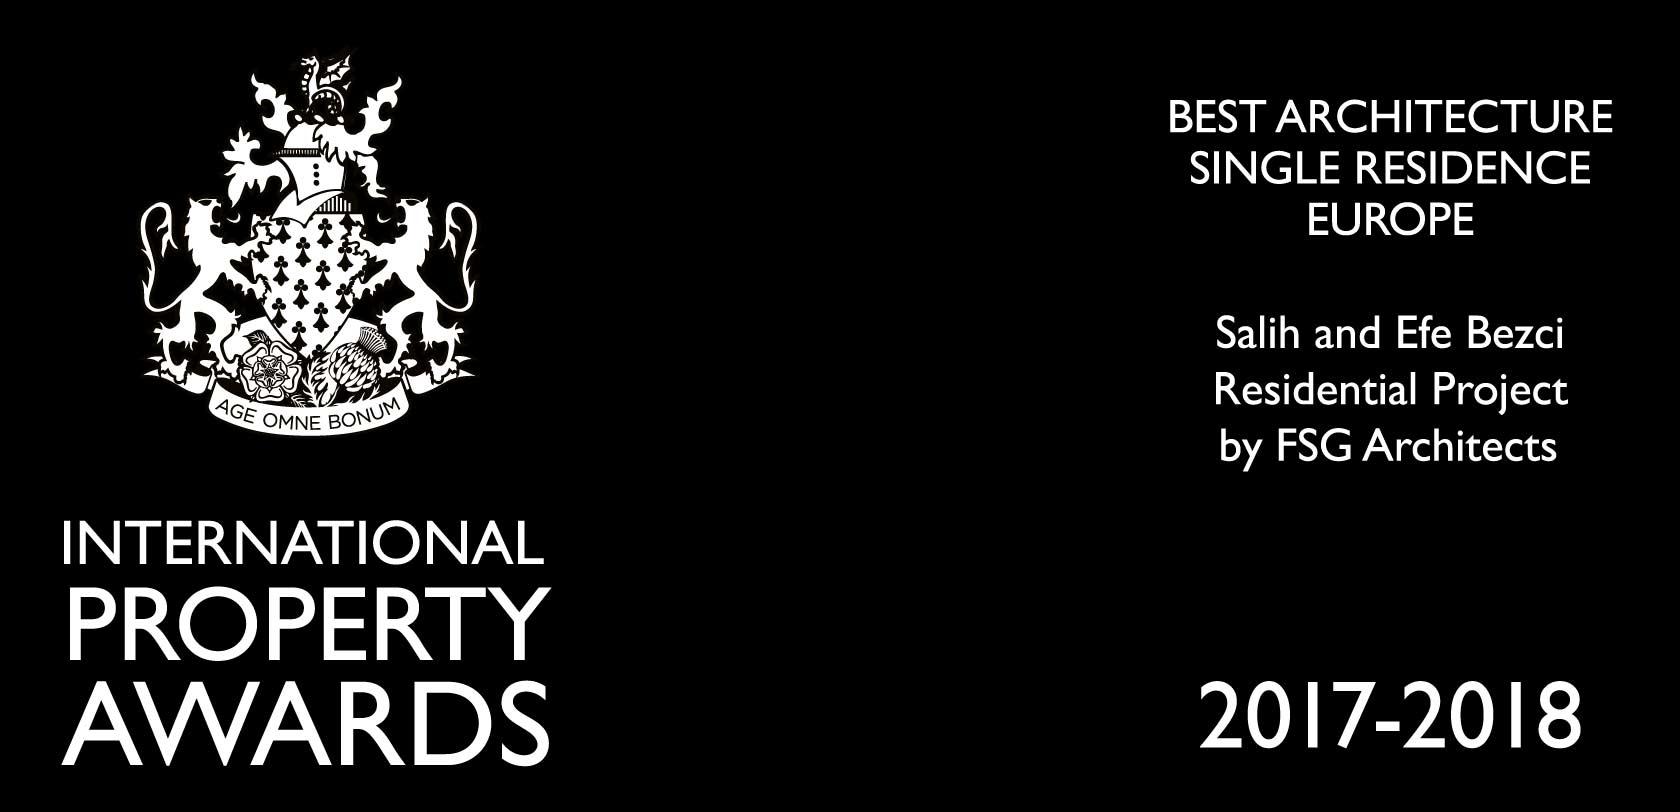 International Property Awards 2017-2018